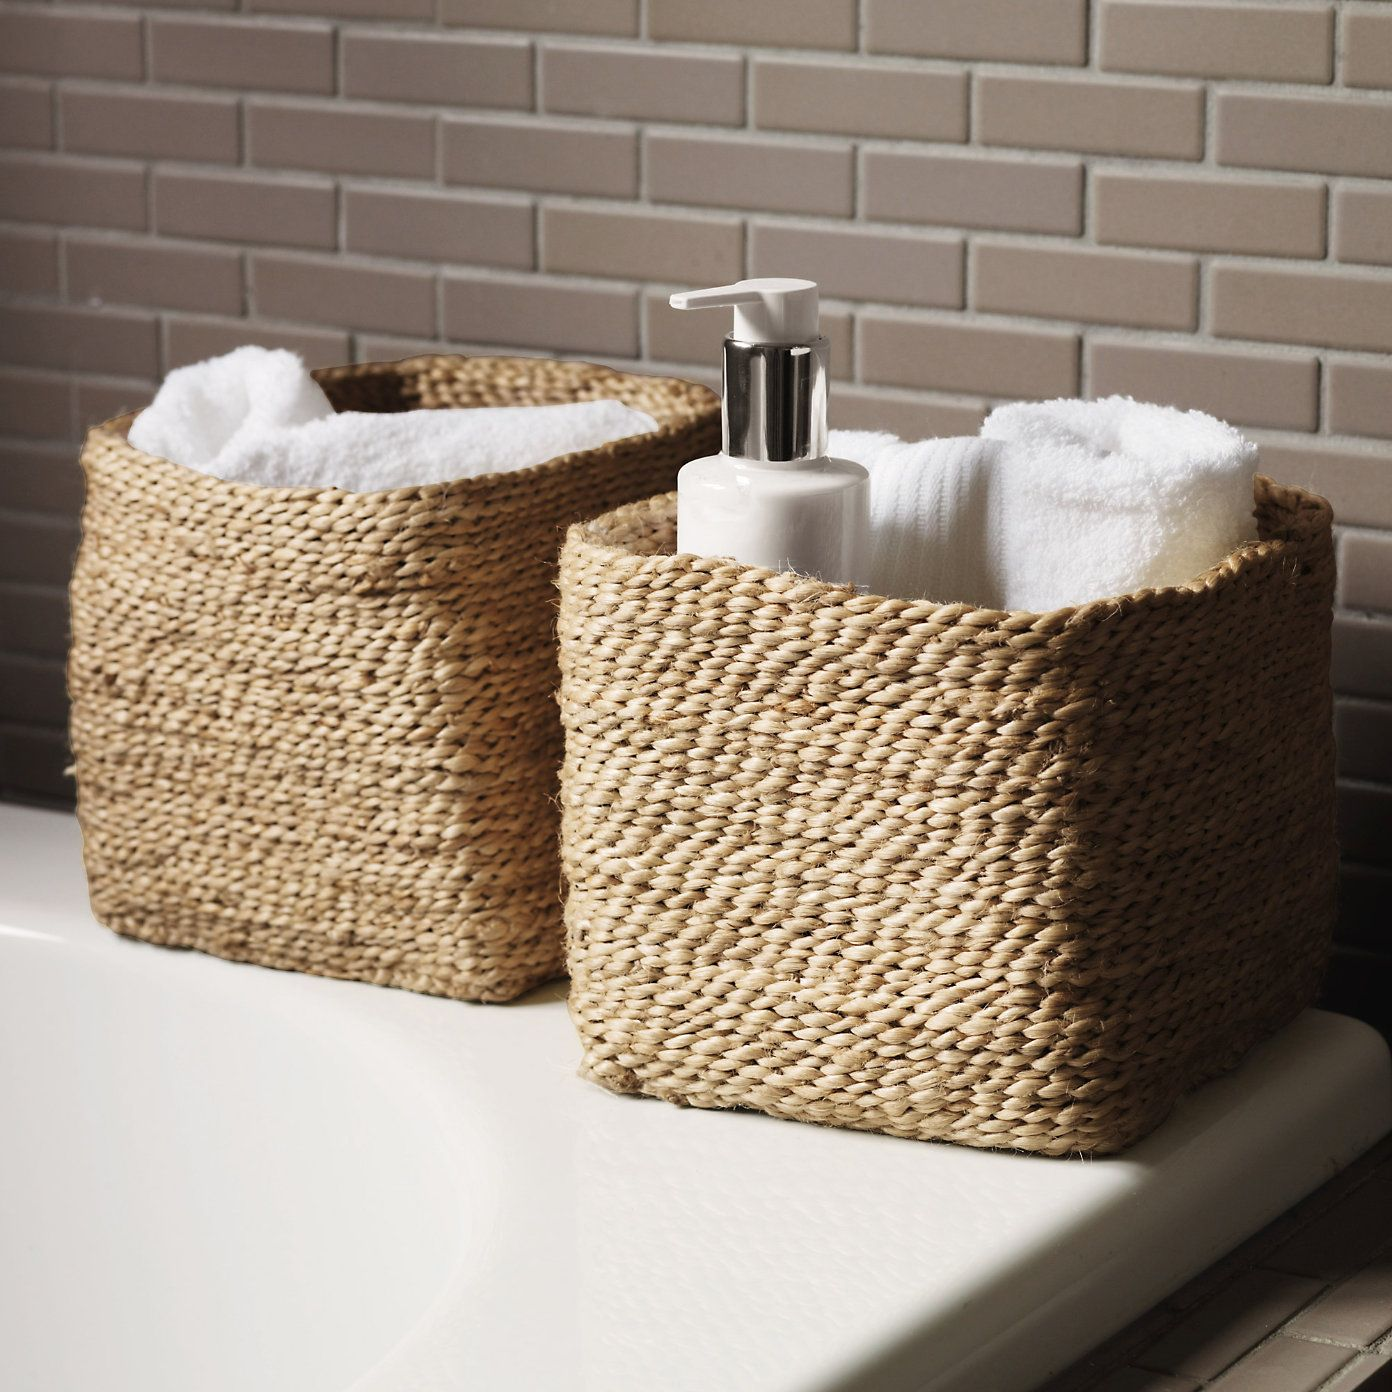 Small Jute Storage Basket Bathroom Accessories The White Company